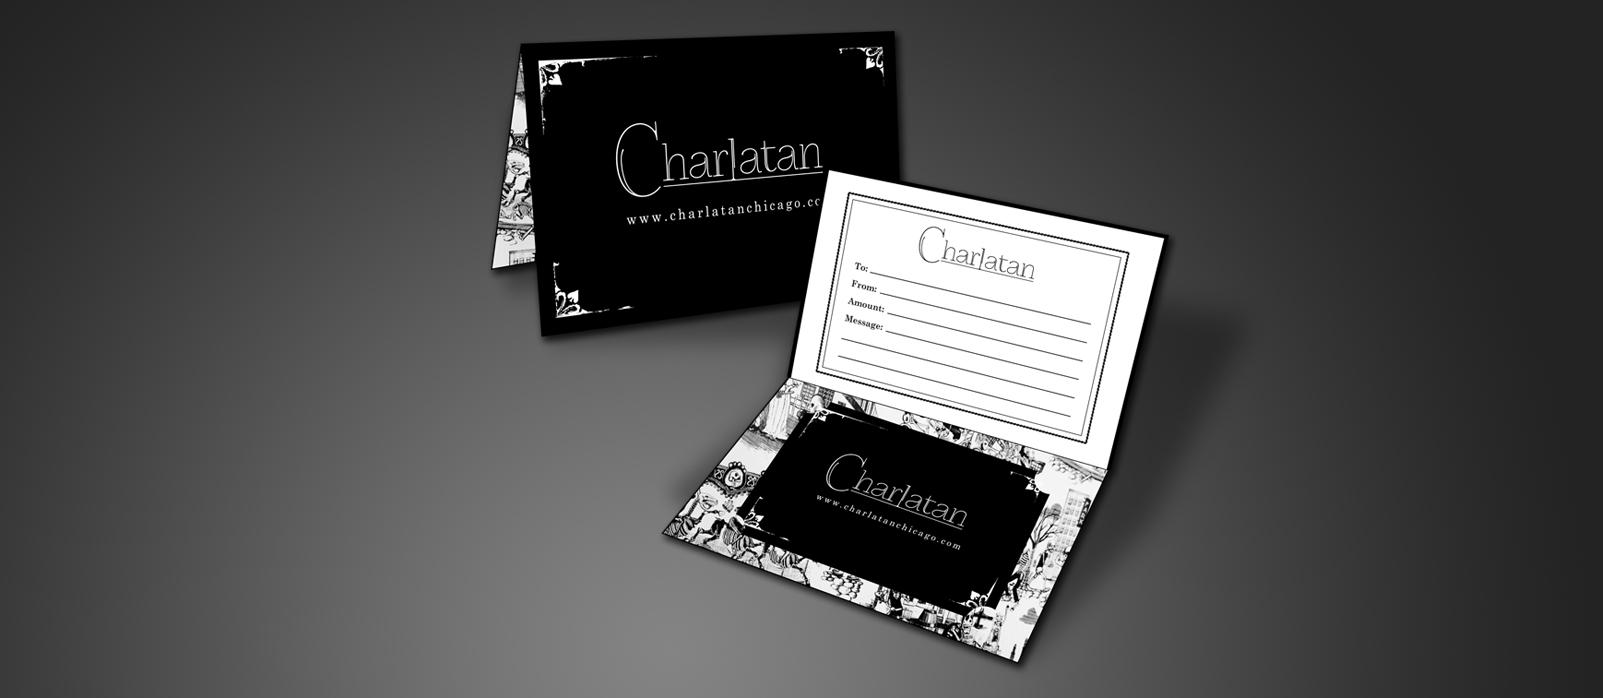 Charlatan Chicago, Gift Card Design, Gift Card Holder, Logo Design, Print Production